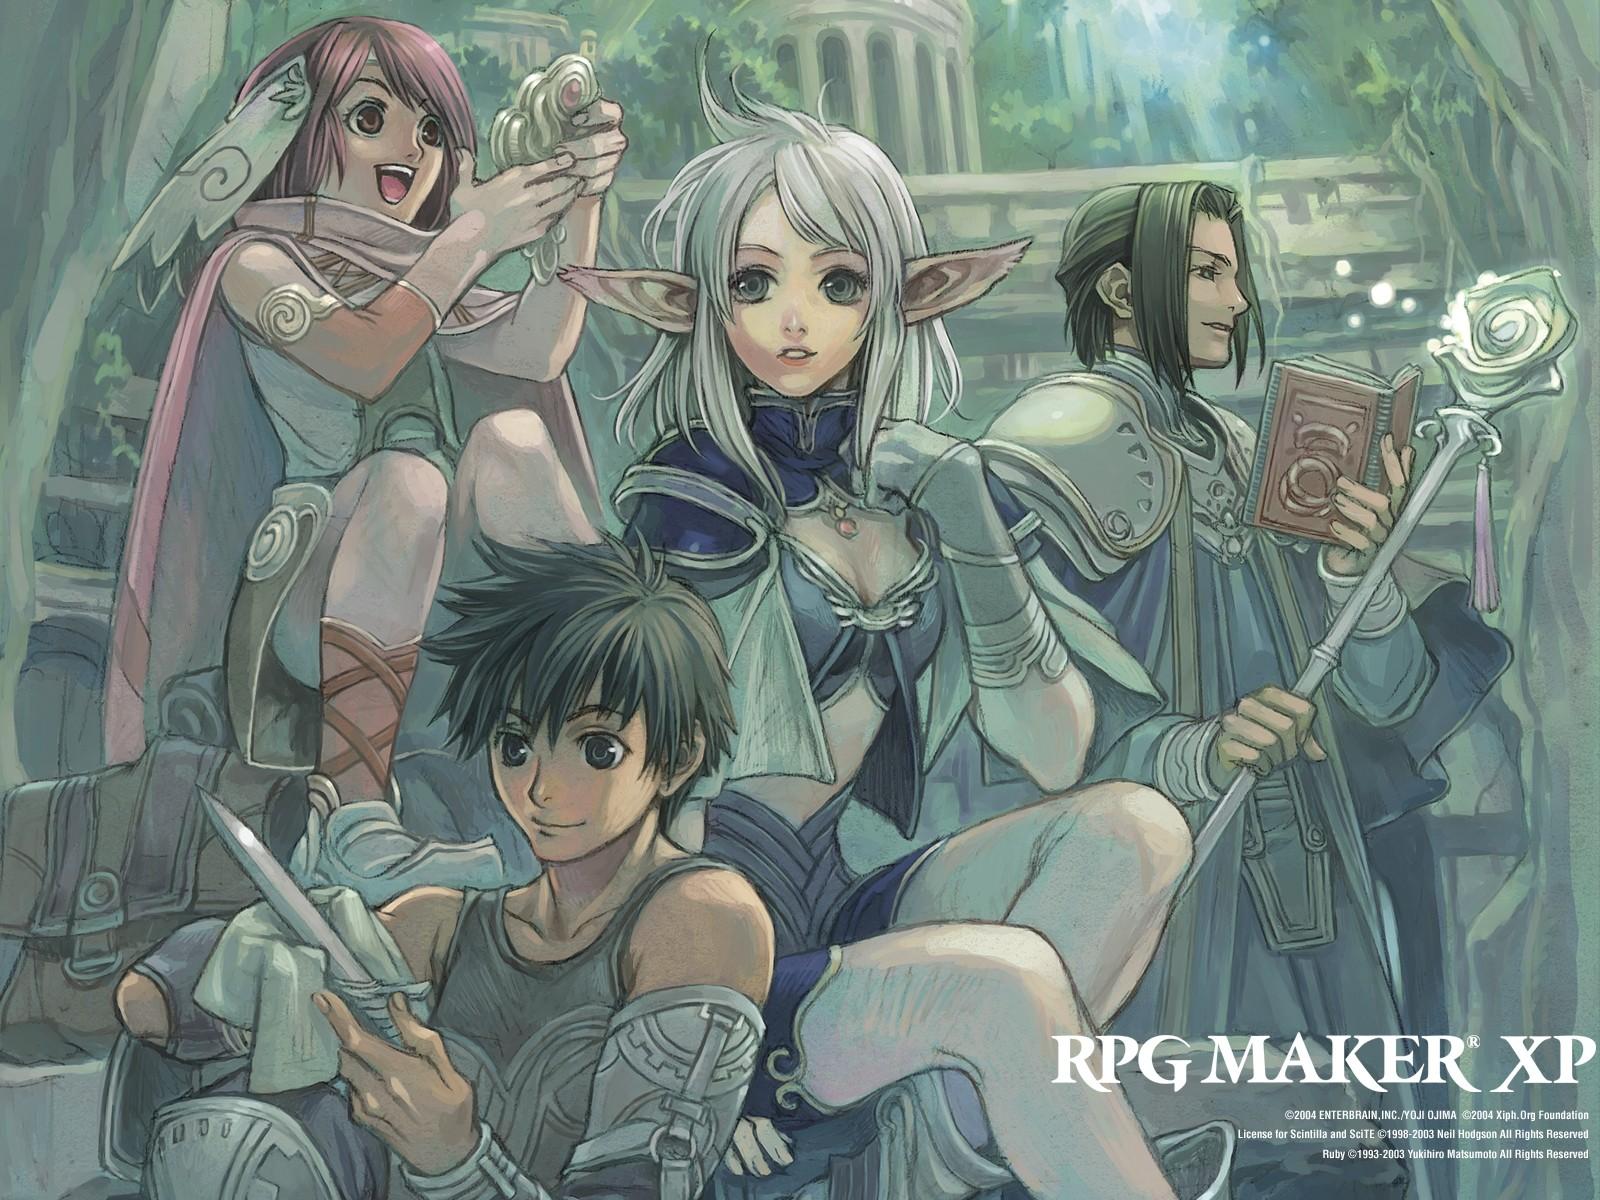 Illustration Anime Wizard Rpg Elves Comics Rpg Maker Screenshot Mangaka Comics Artist Comic Book